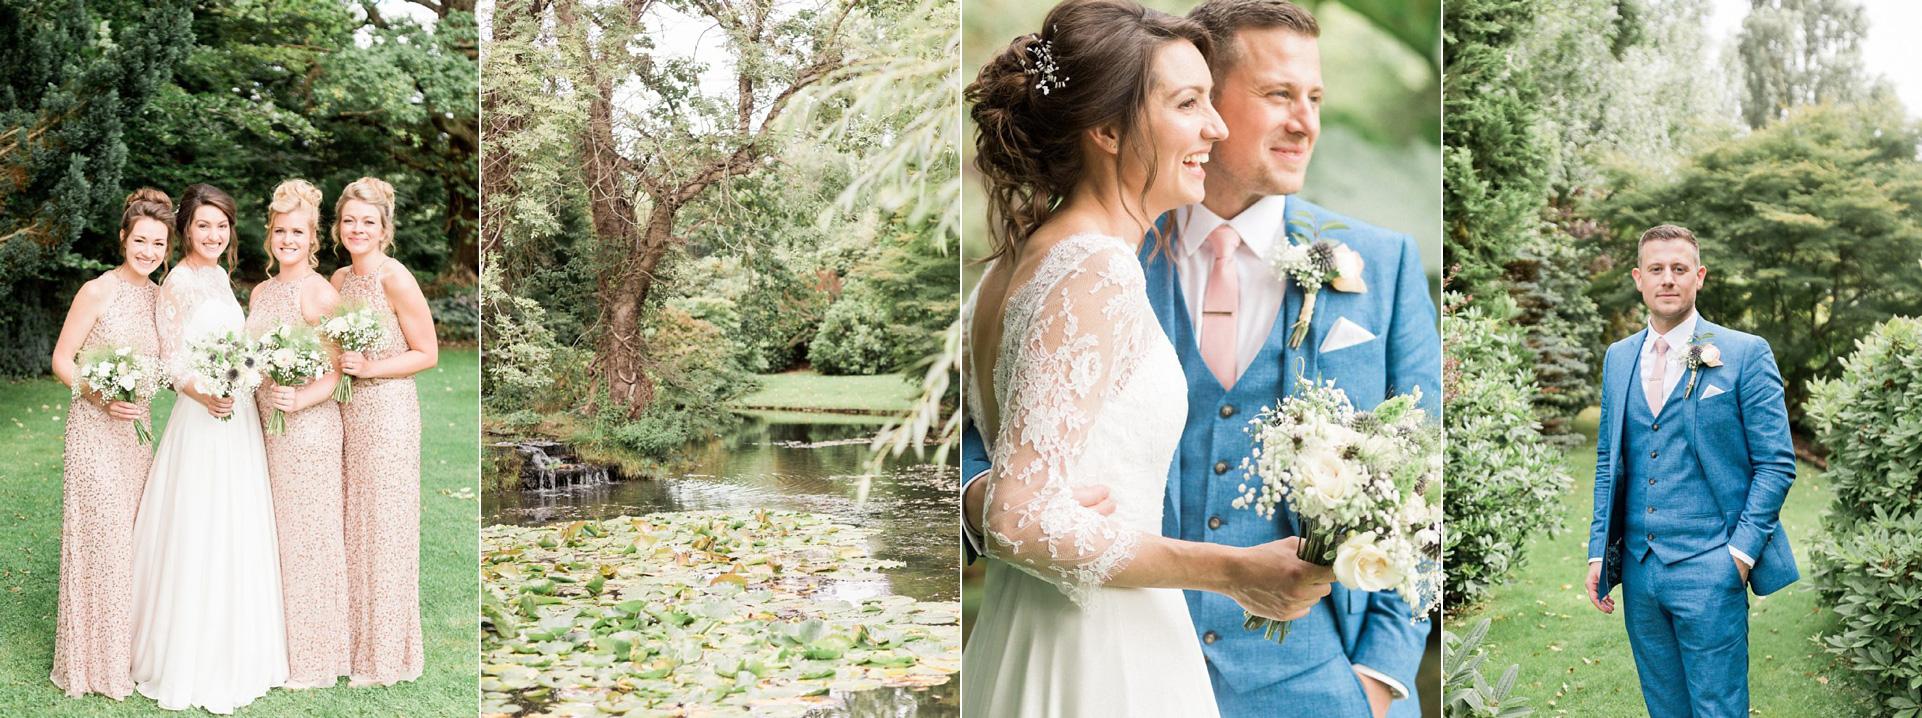 Luxury-Wedding-Photography-by-Fine-Art-Wedding-Photography-Lilybean-Photography-06